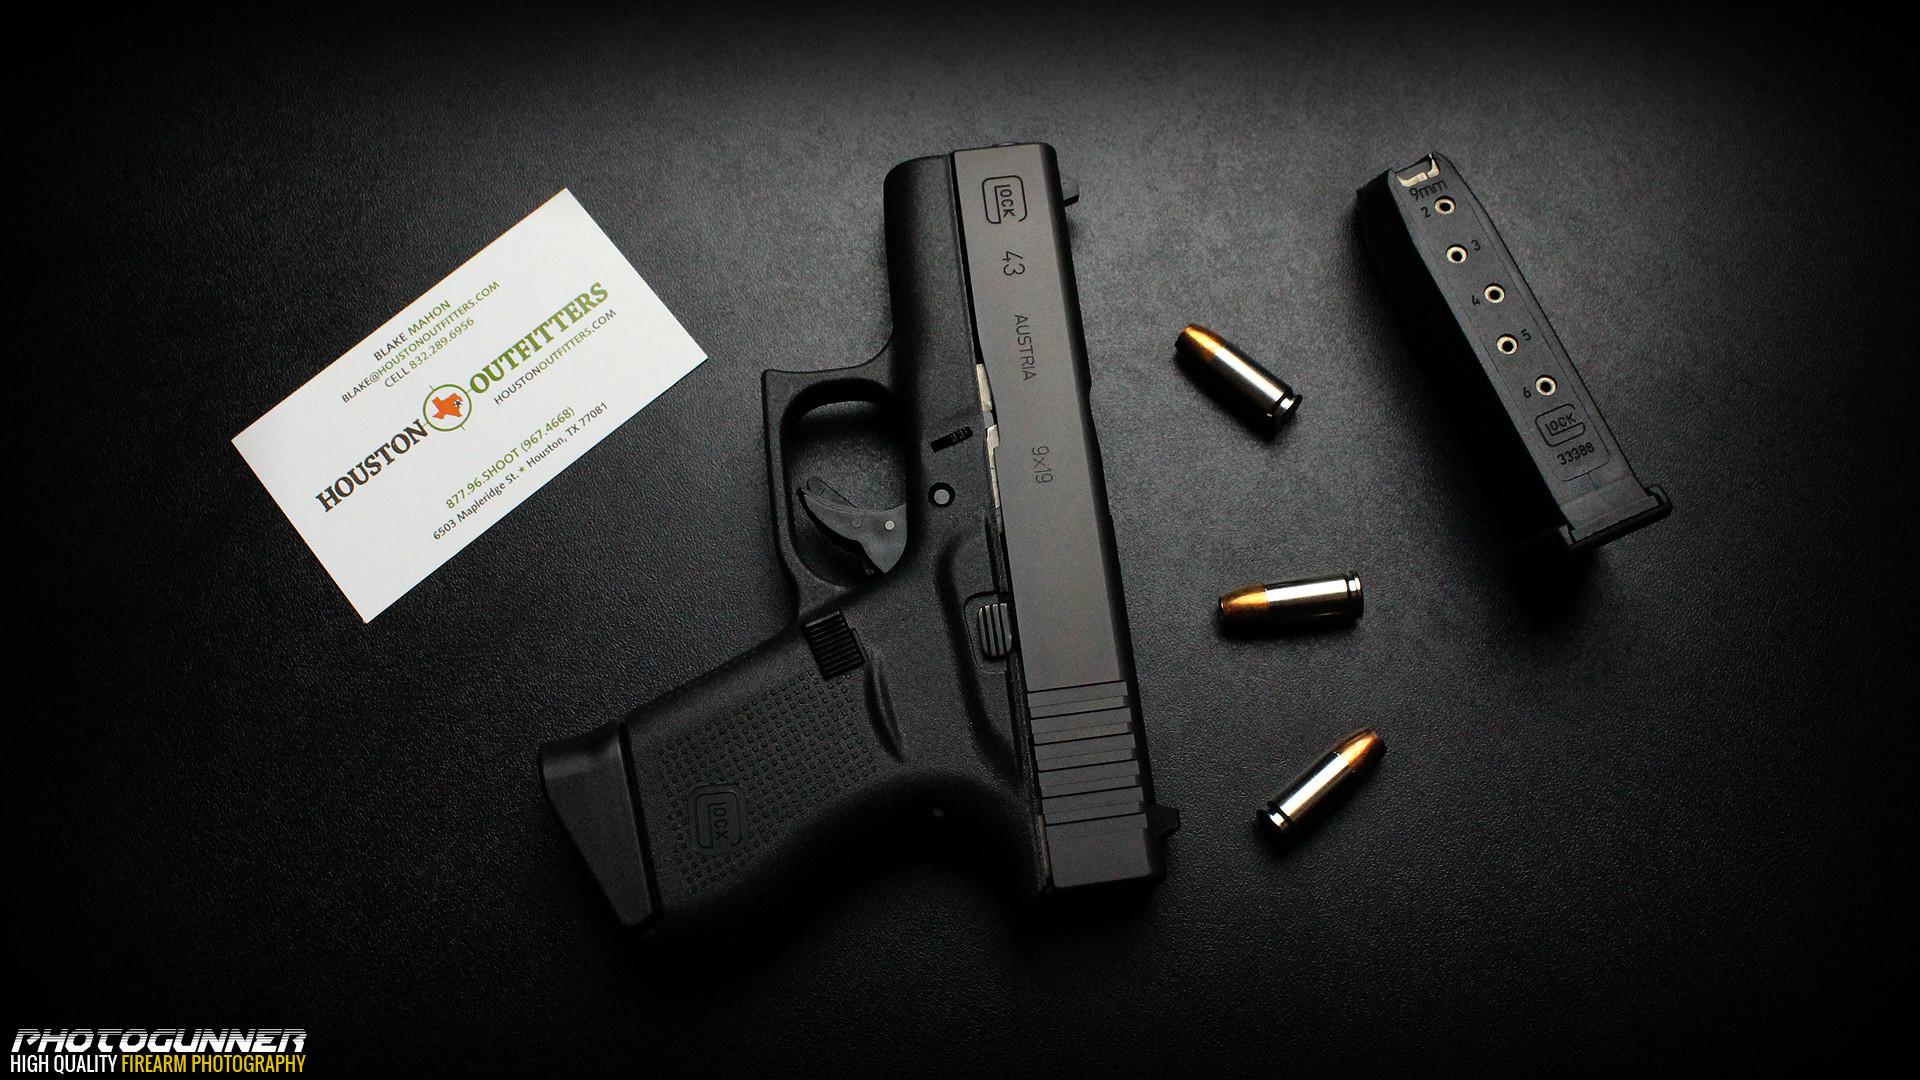 Glock 43 wallpaper 59 images - Glock wallpaper ...